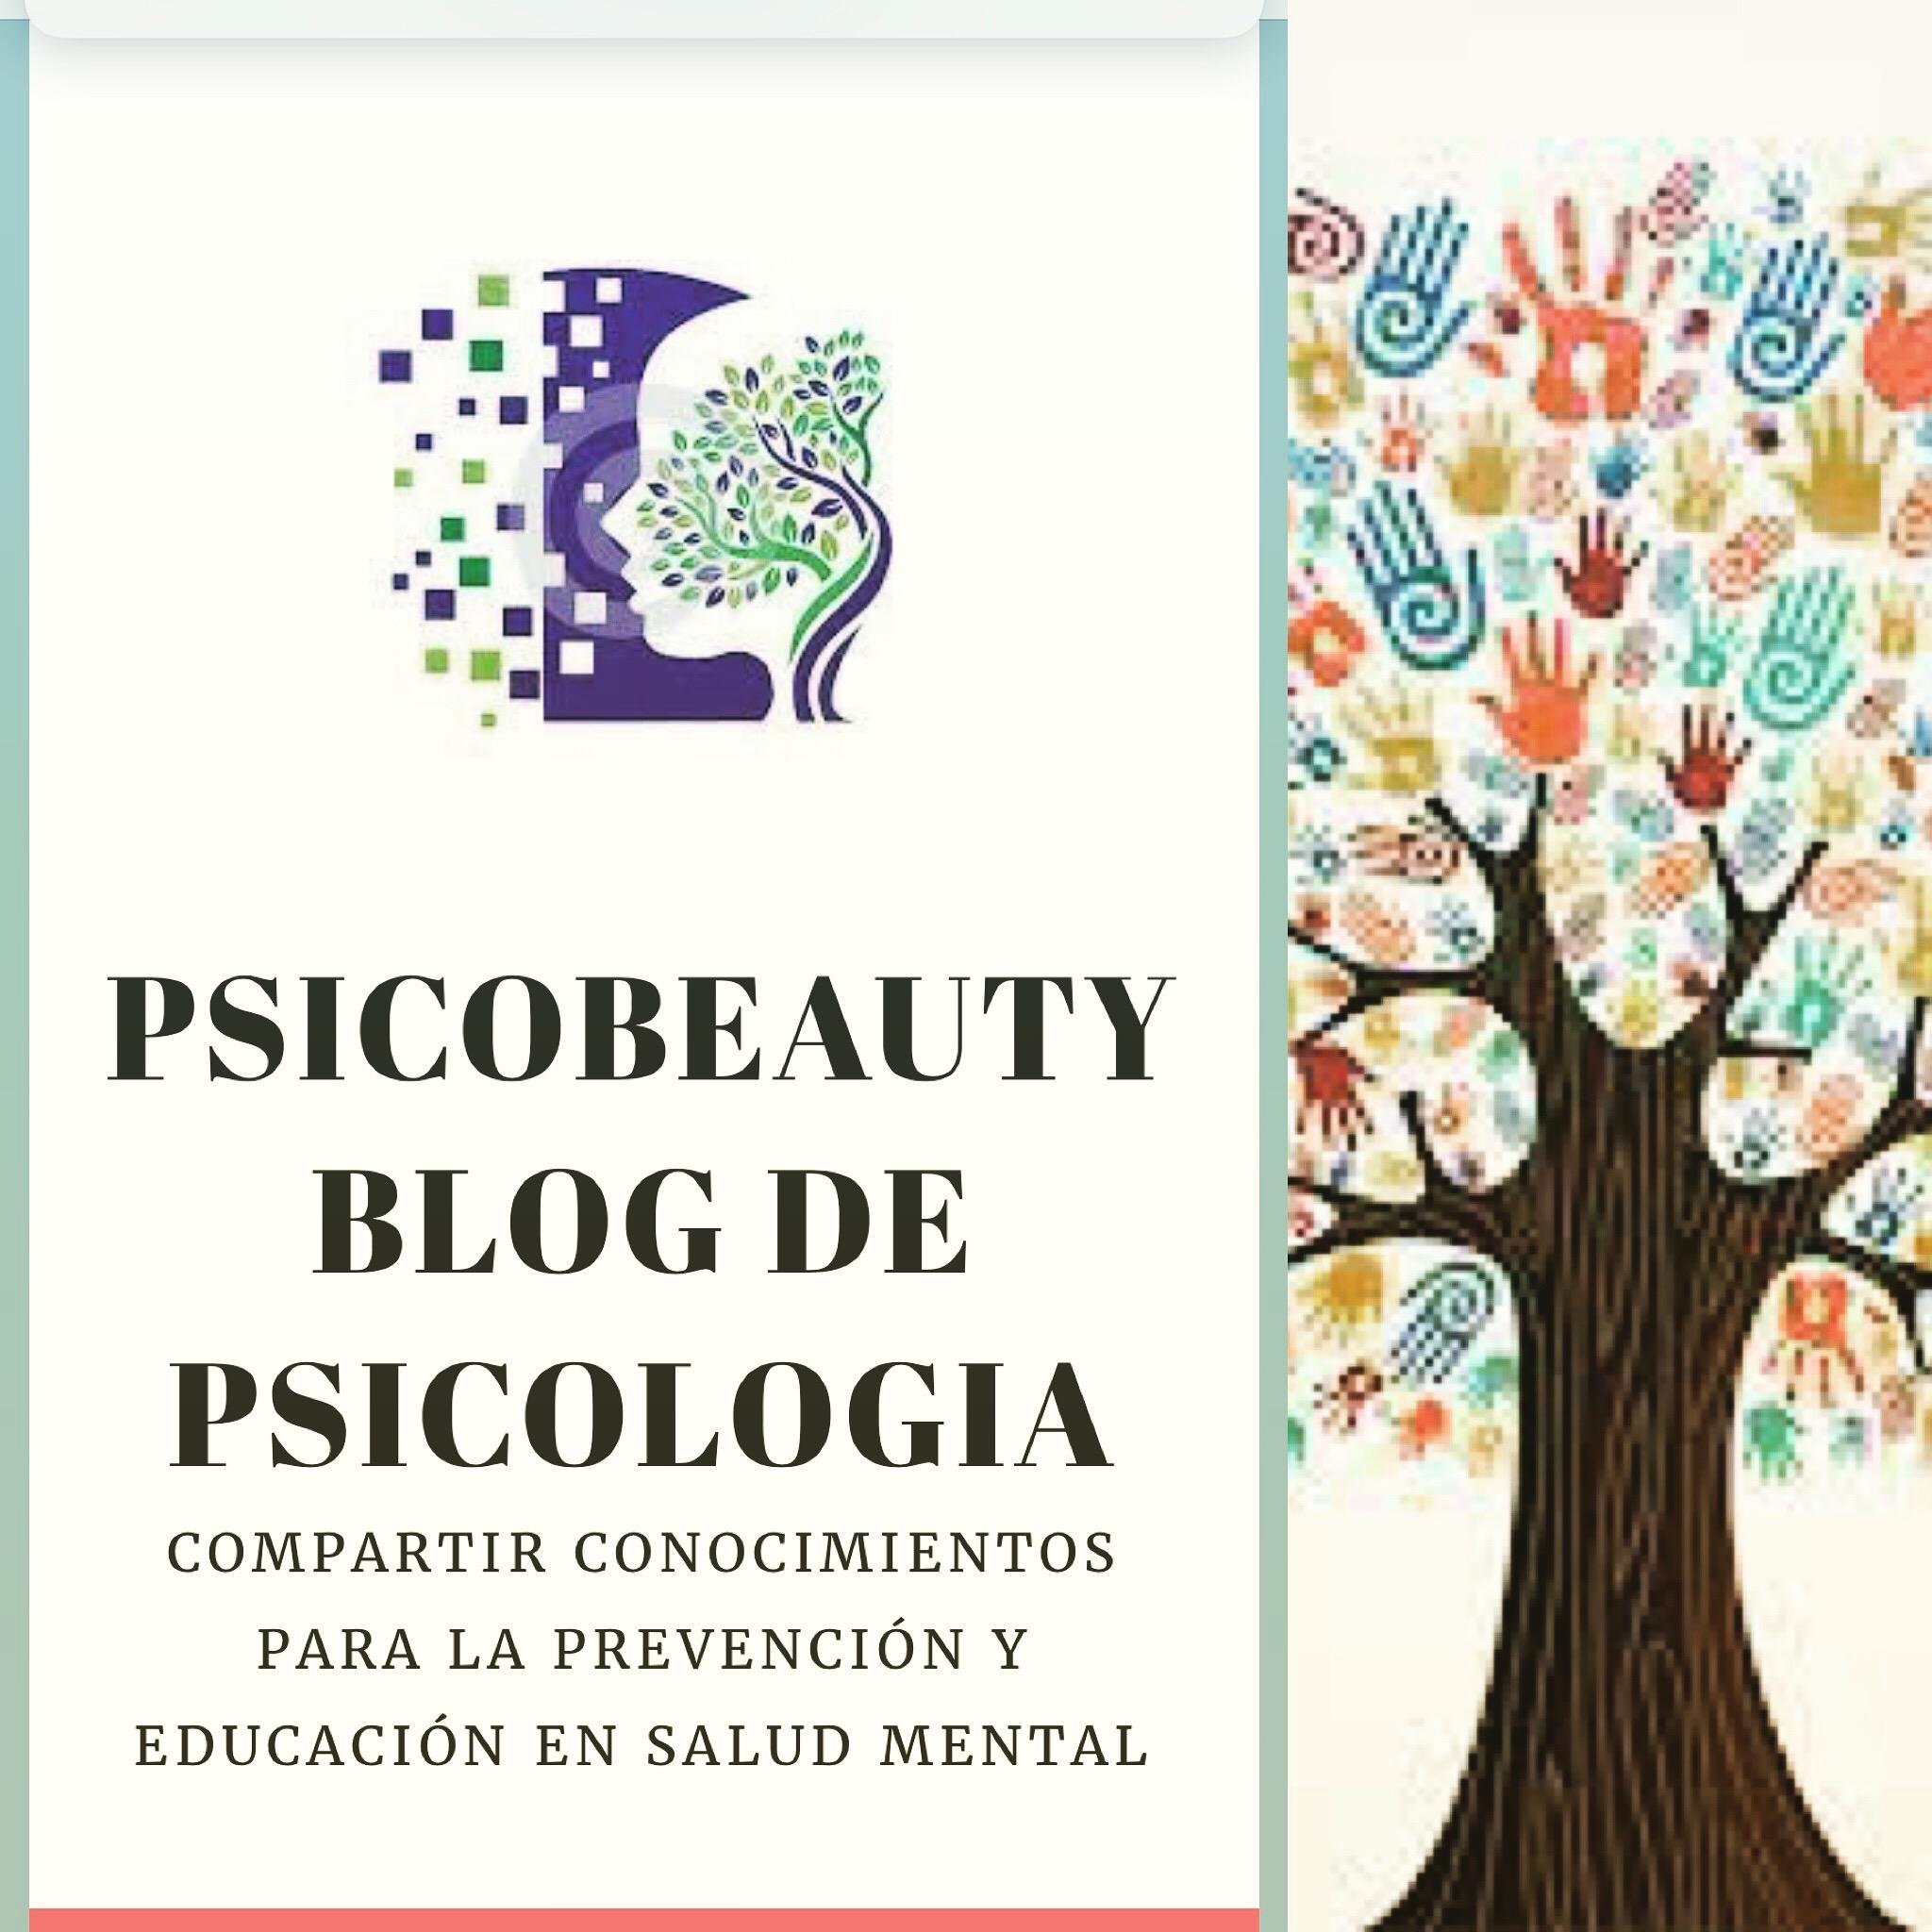 psicobeauty blog de psicologia